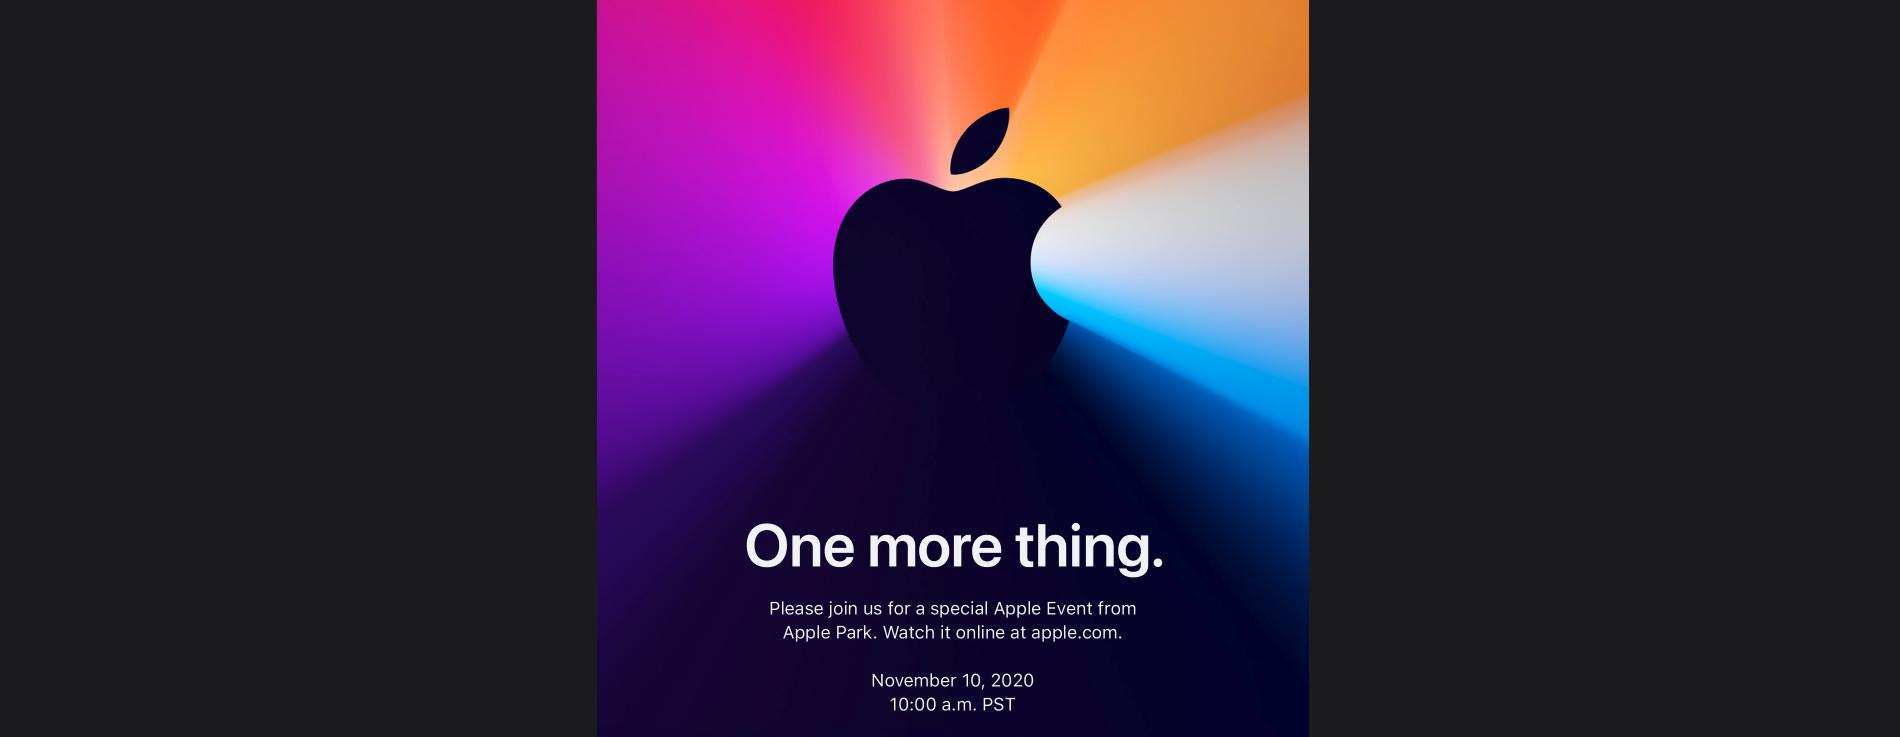 Apple Event November 2020